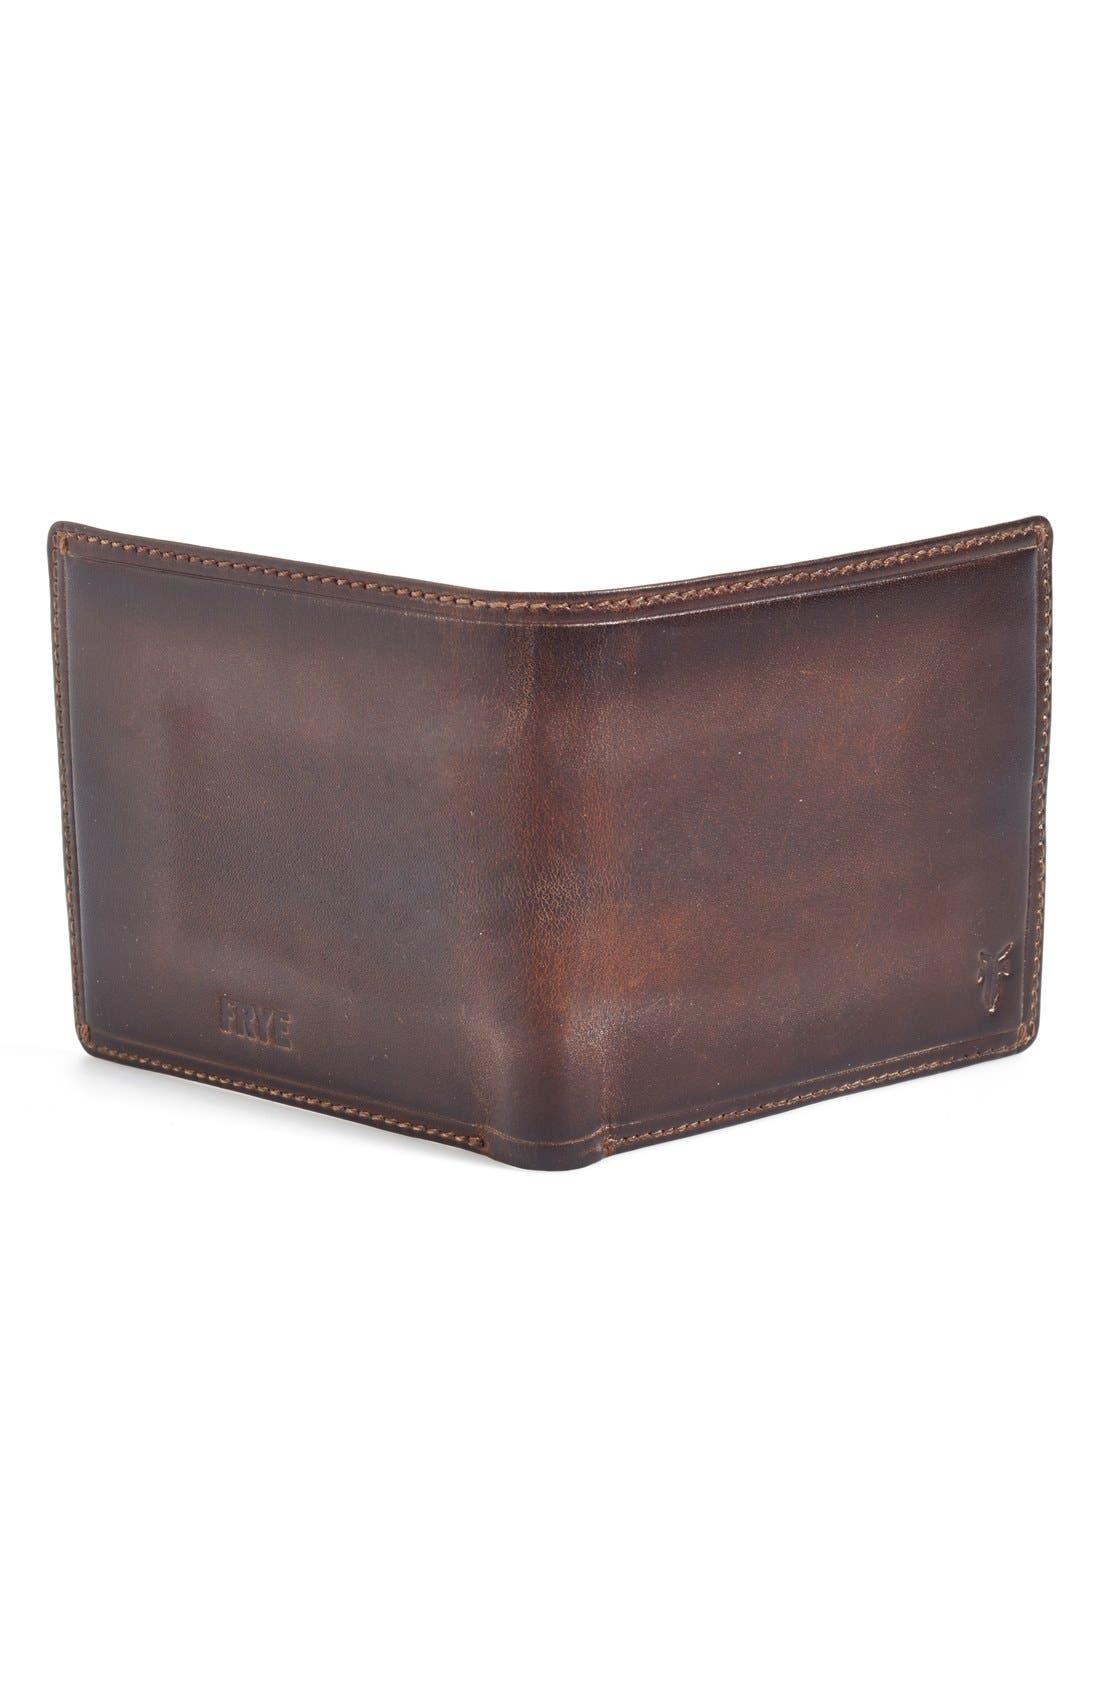 Alternate Image 3  - Frye 'Logan' Leather Billfold Wallet (Online Only)